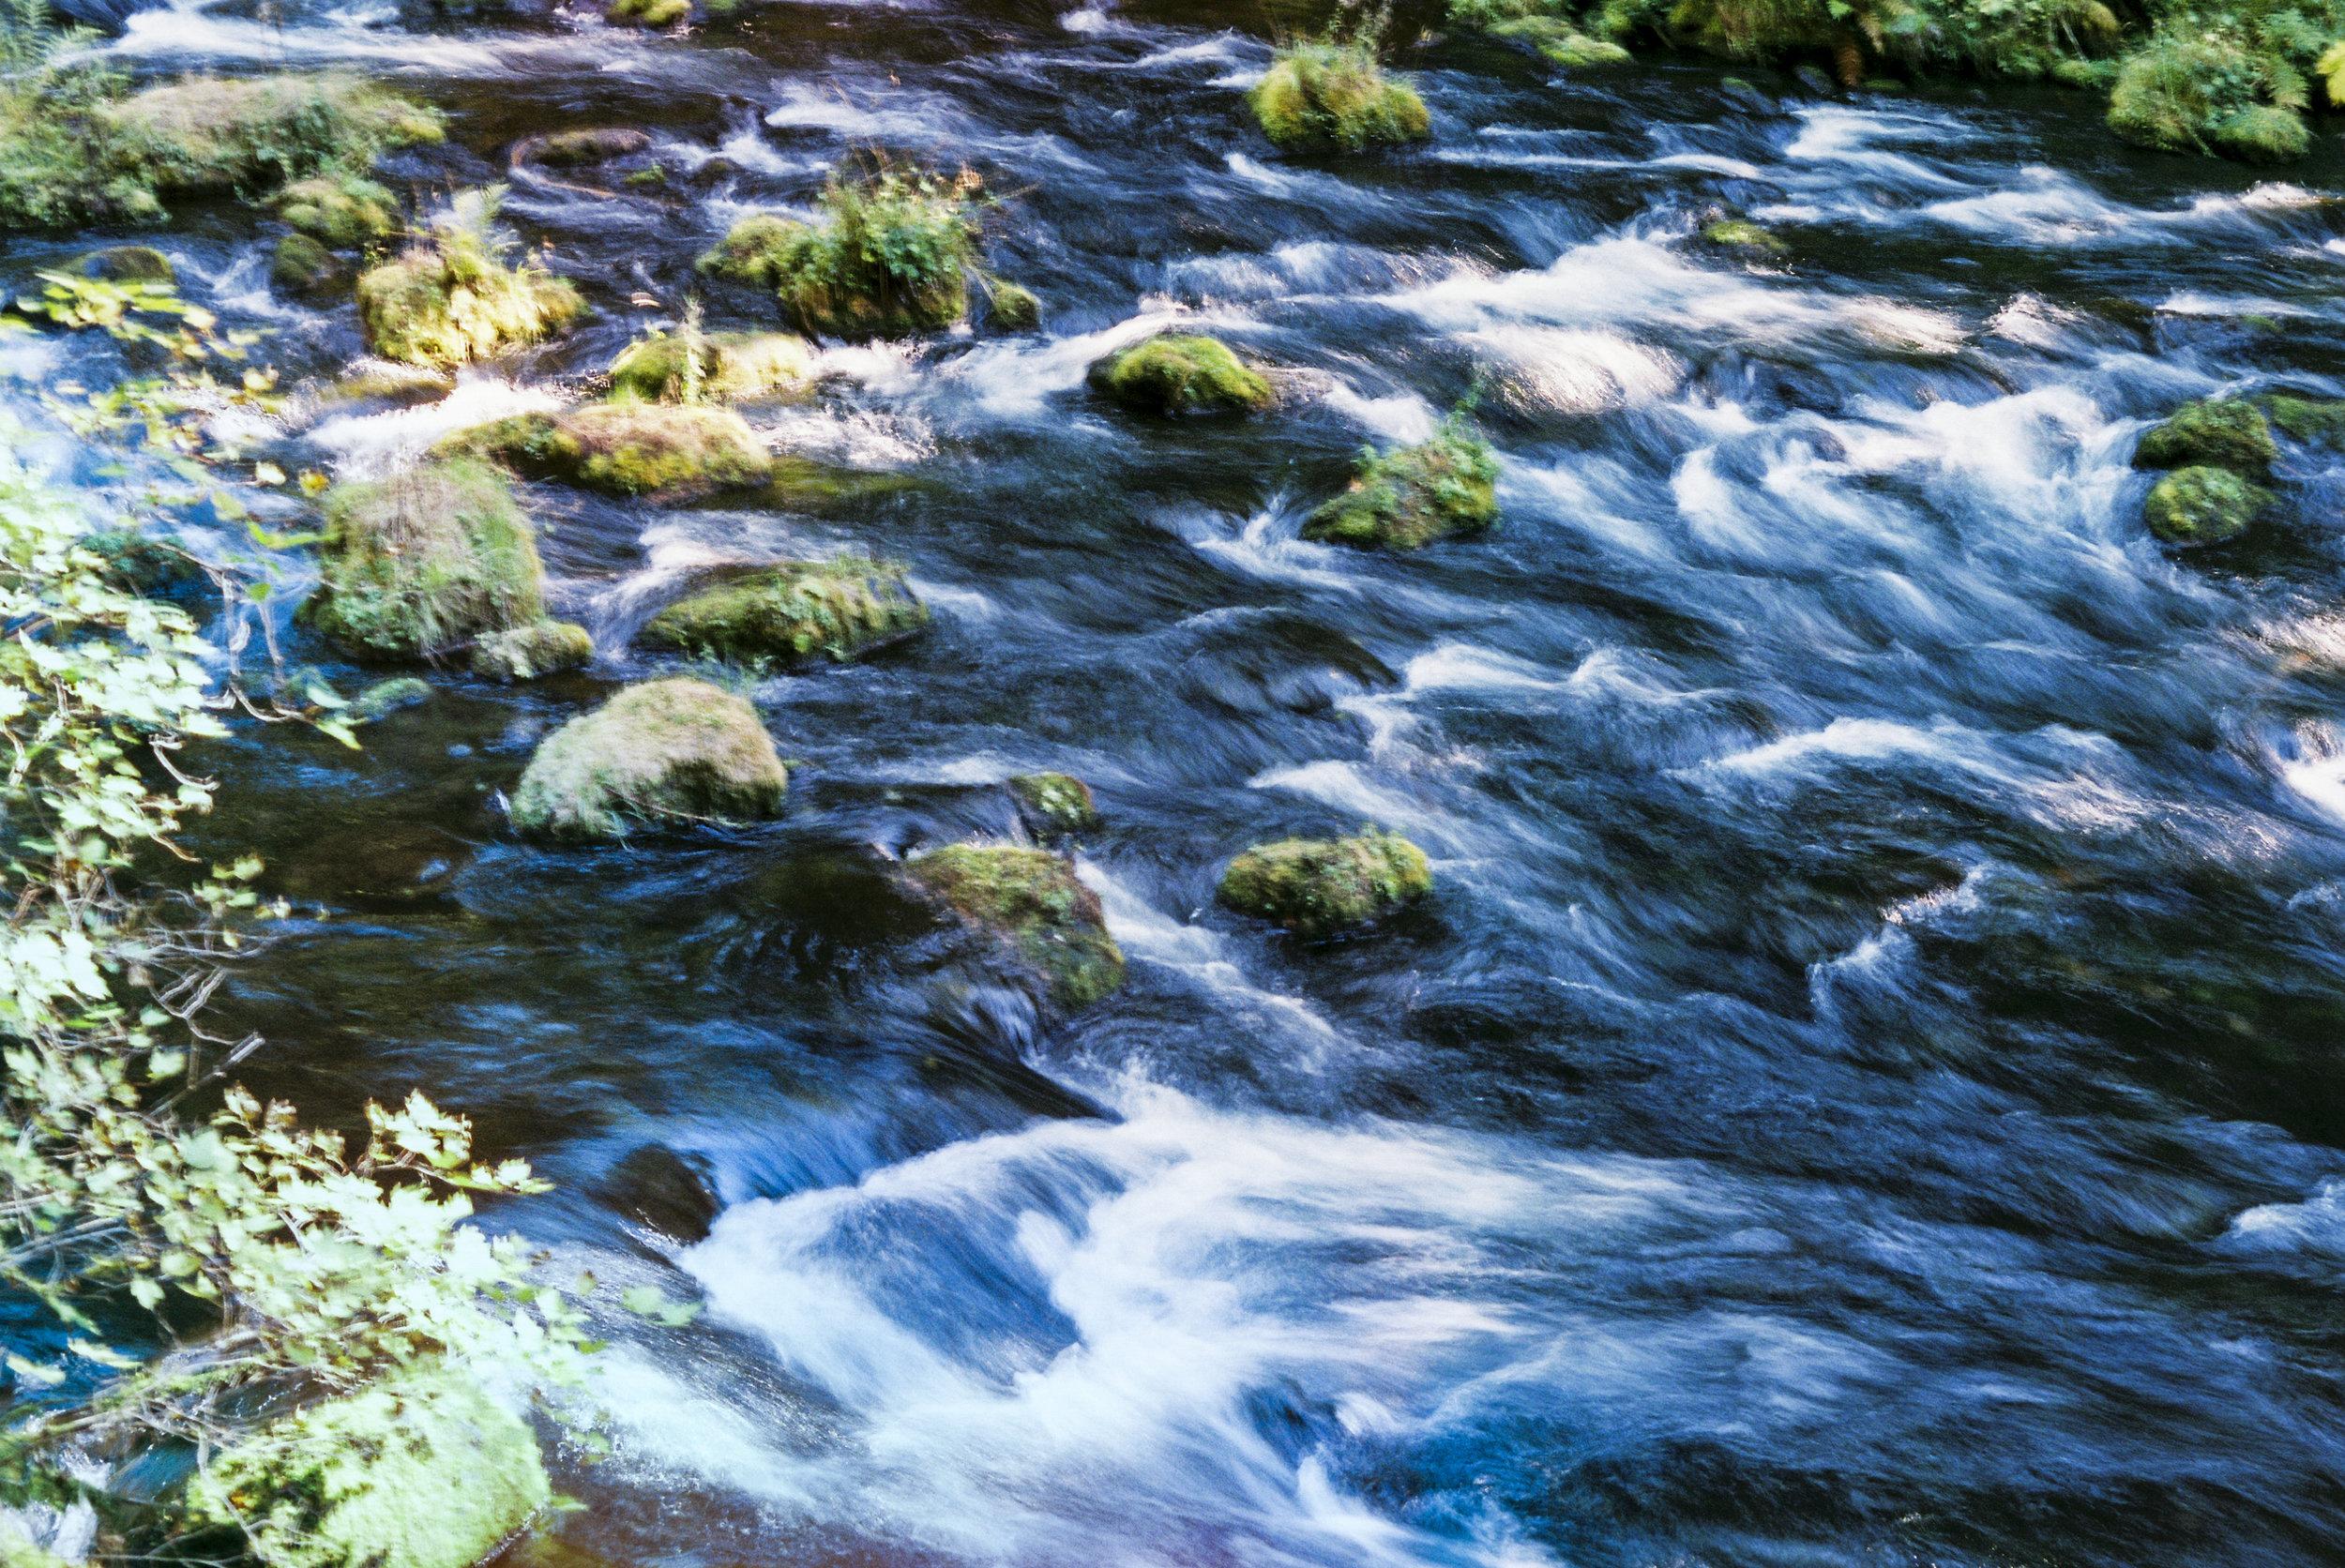 McKenzie River, OR